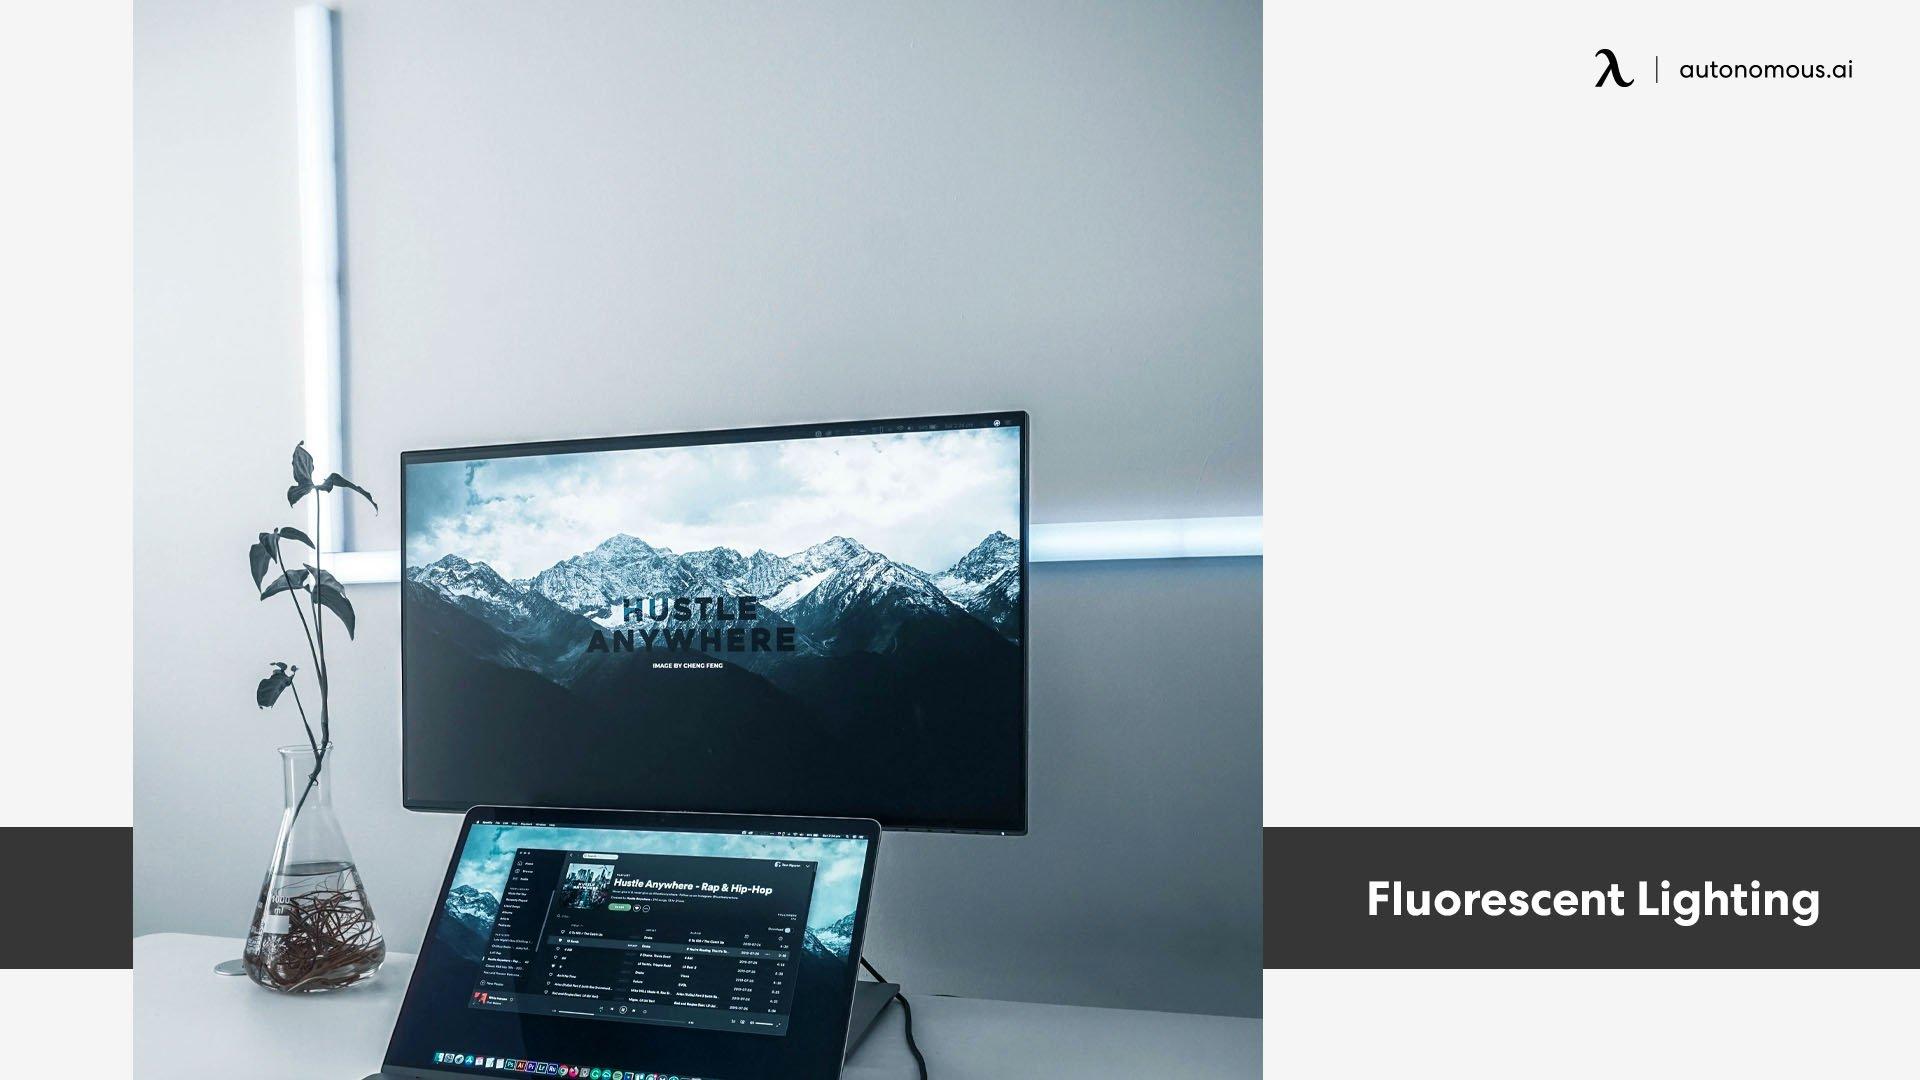 Photo of Fluorescent Lighting